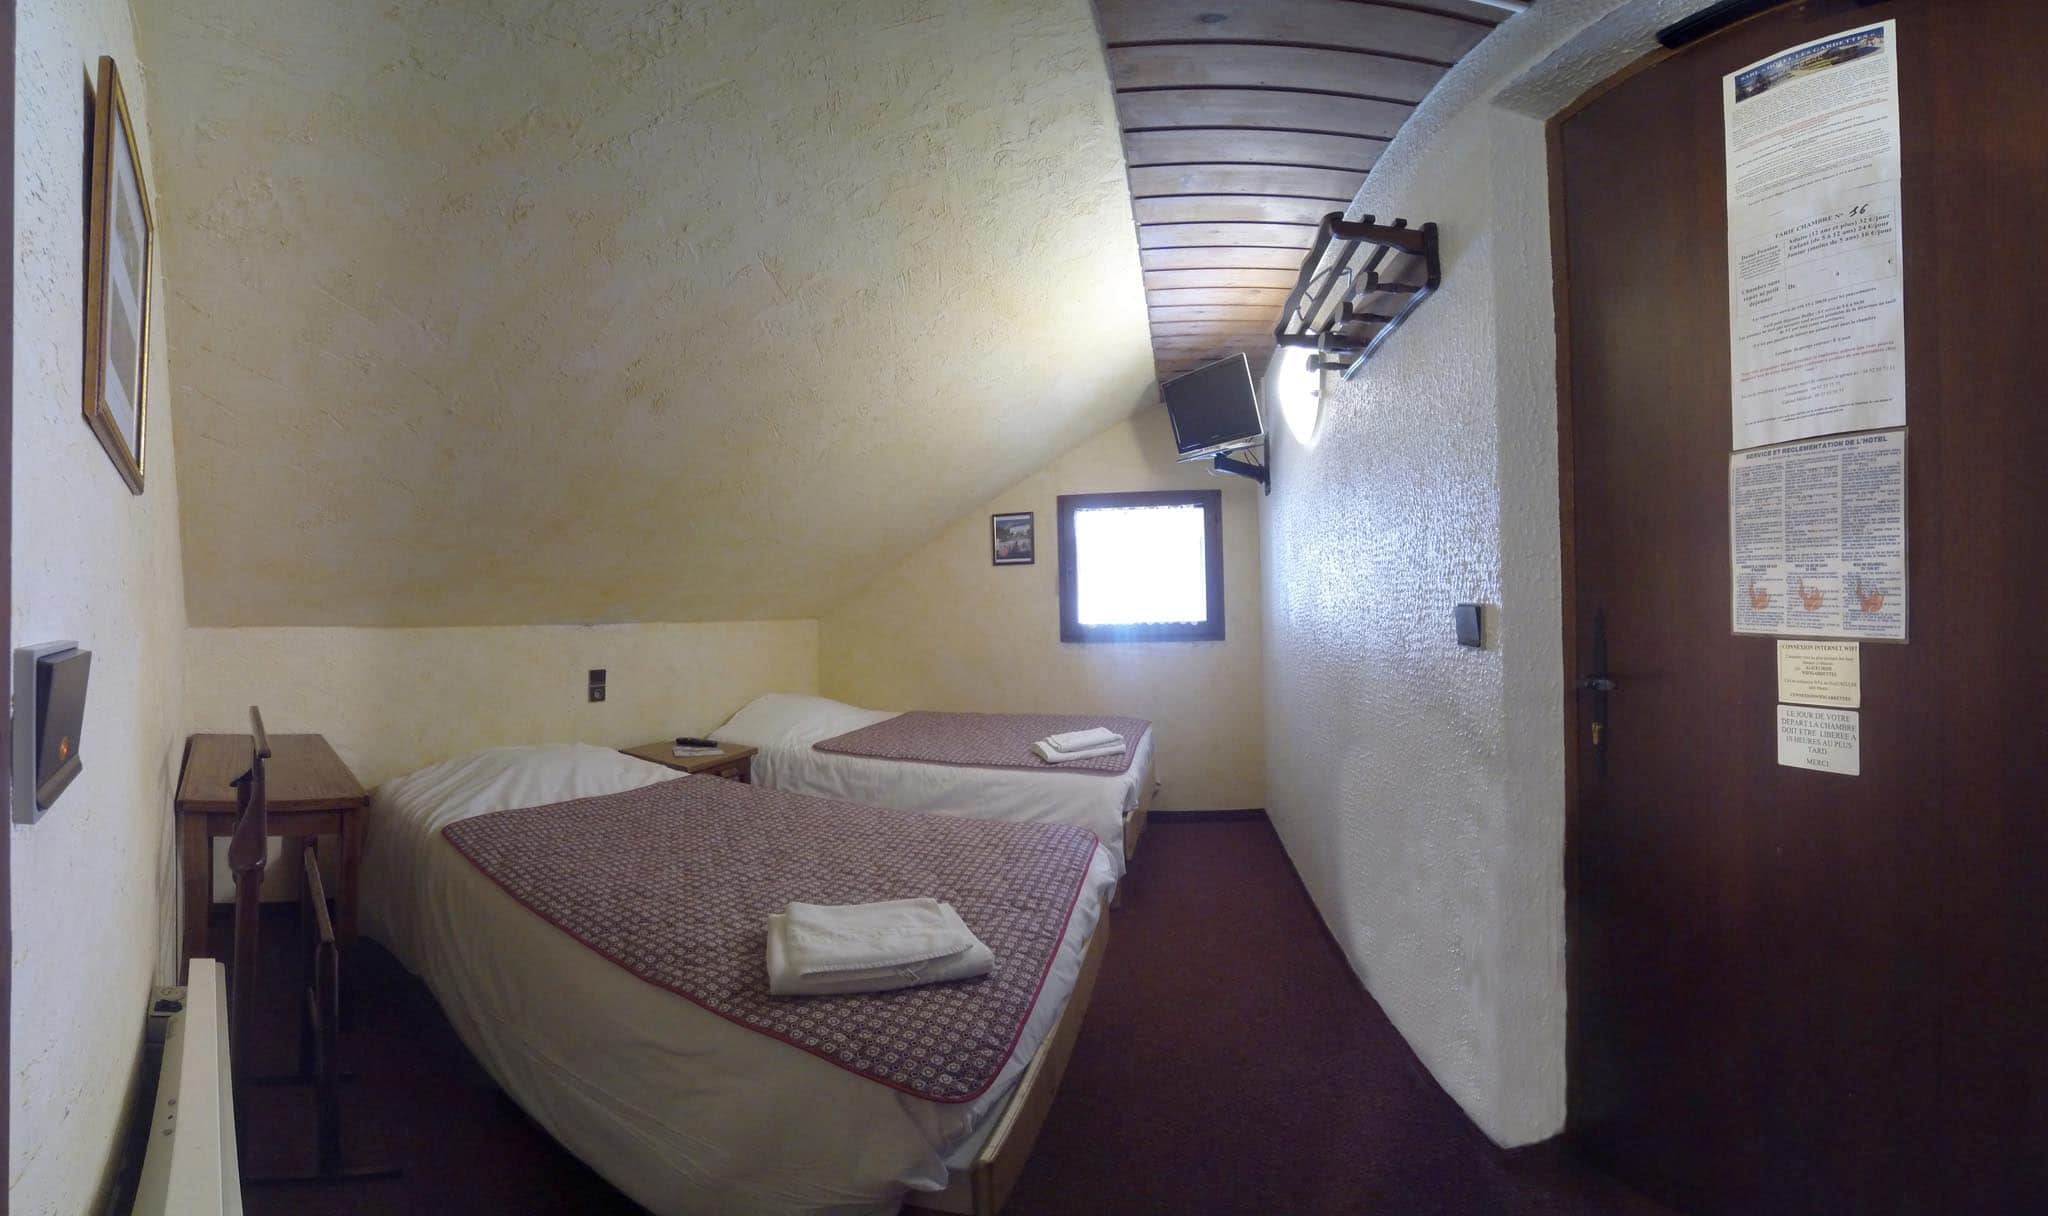 chambre n16 petite chambre mansarde 2 lits simples douche wc